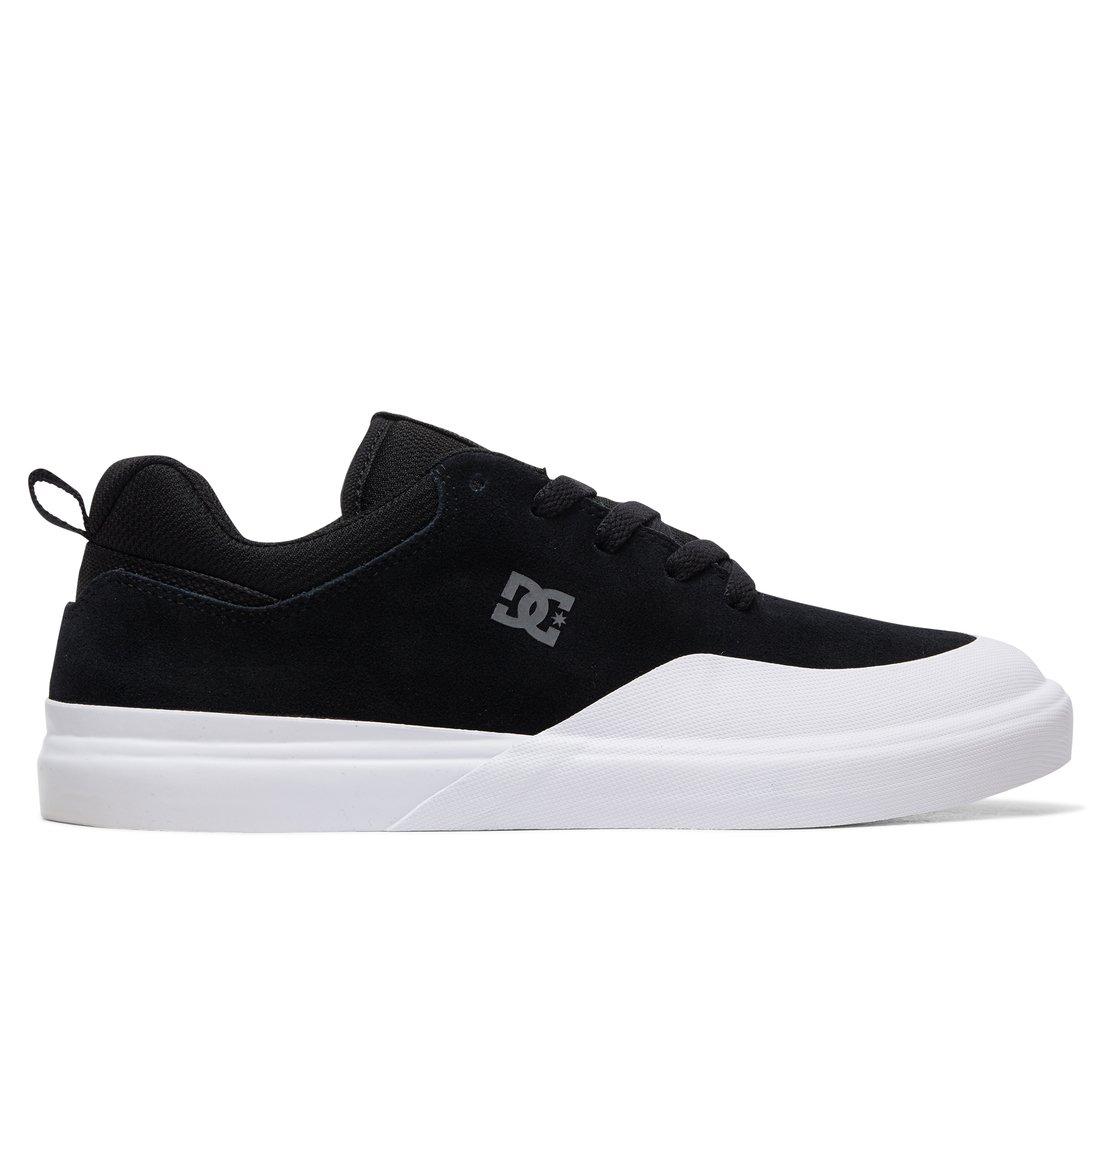 Chaussures de skate white